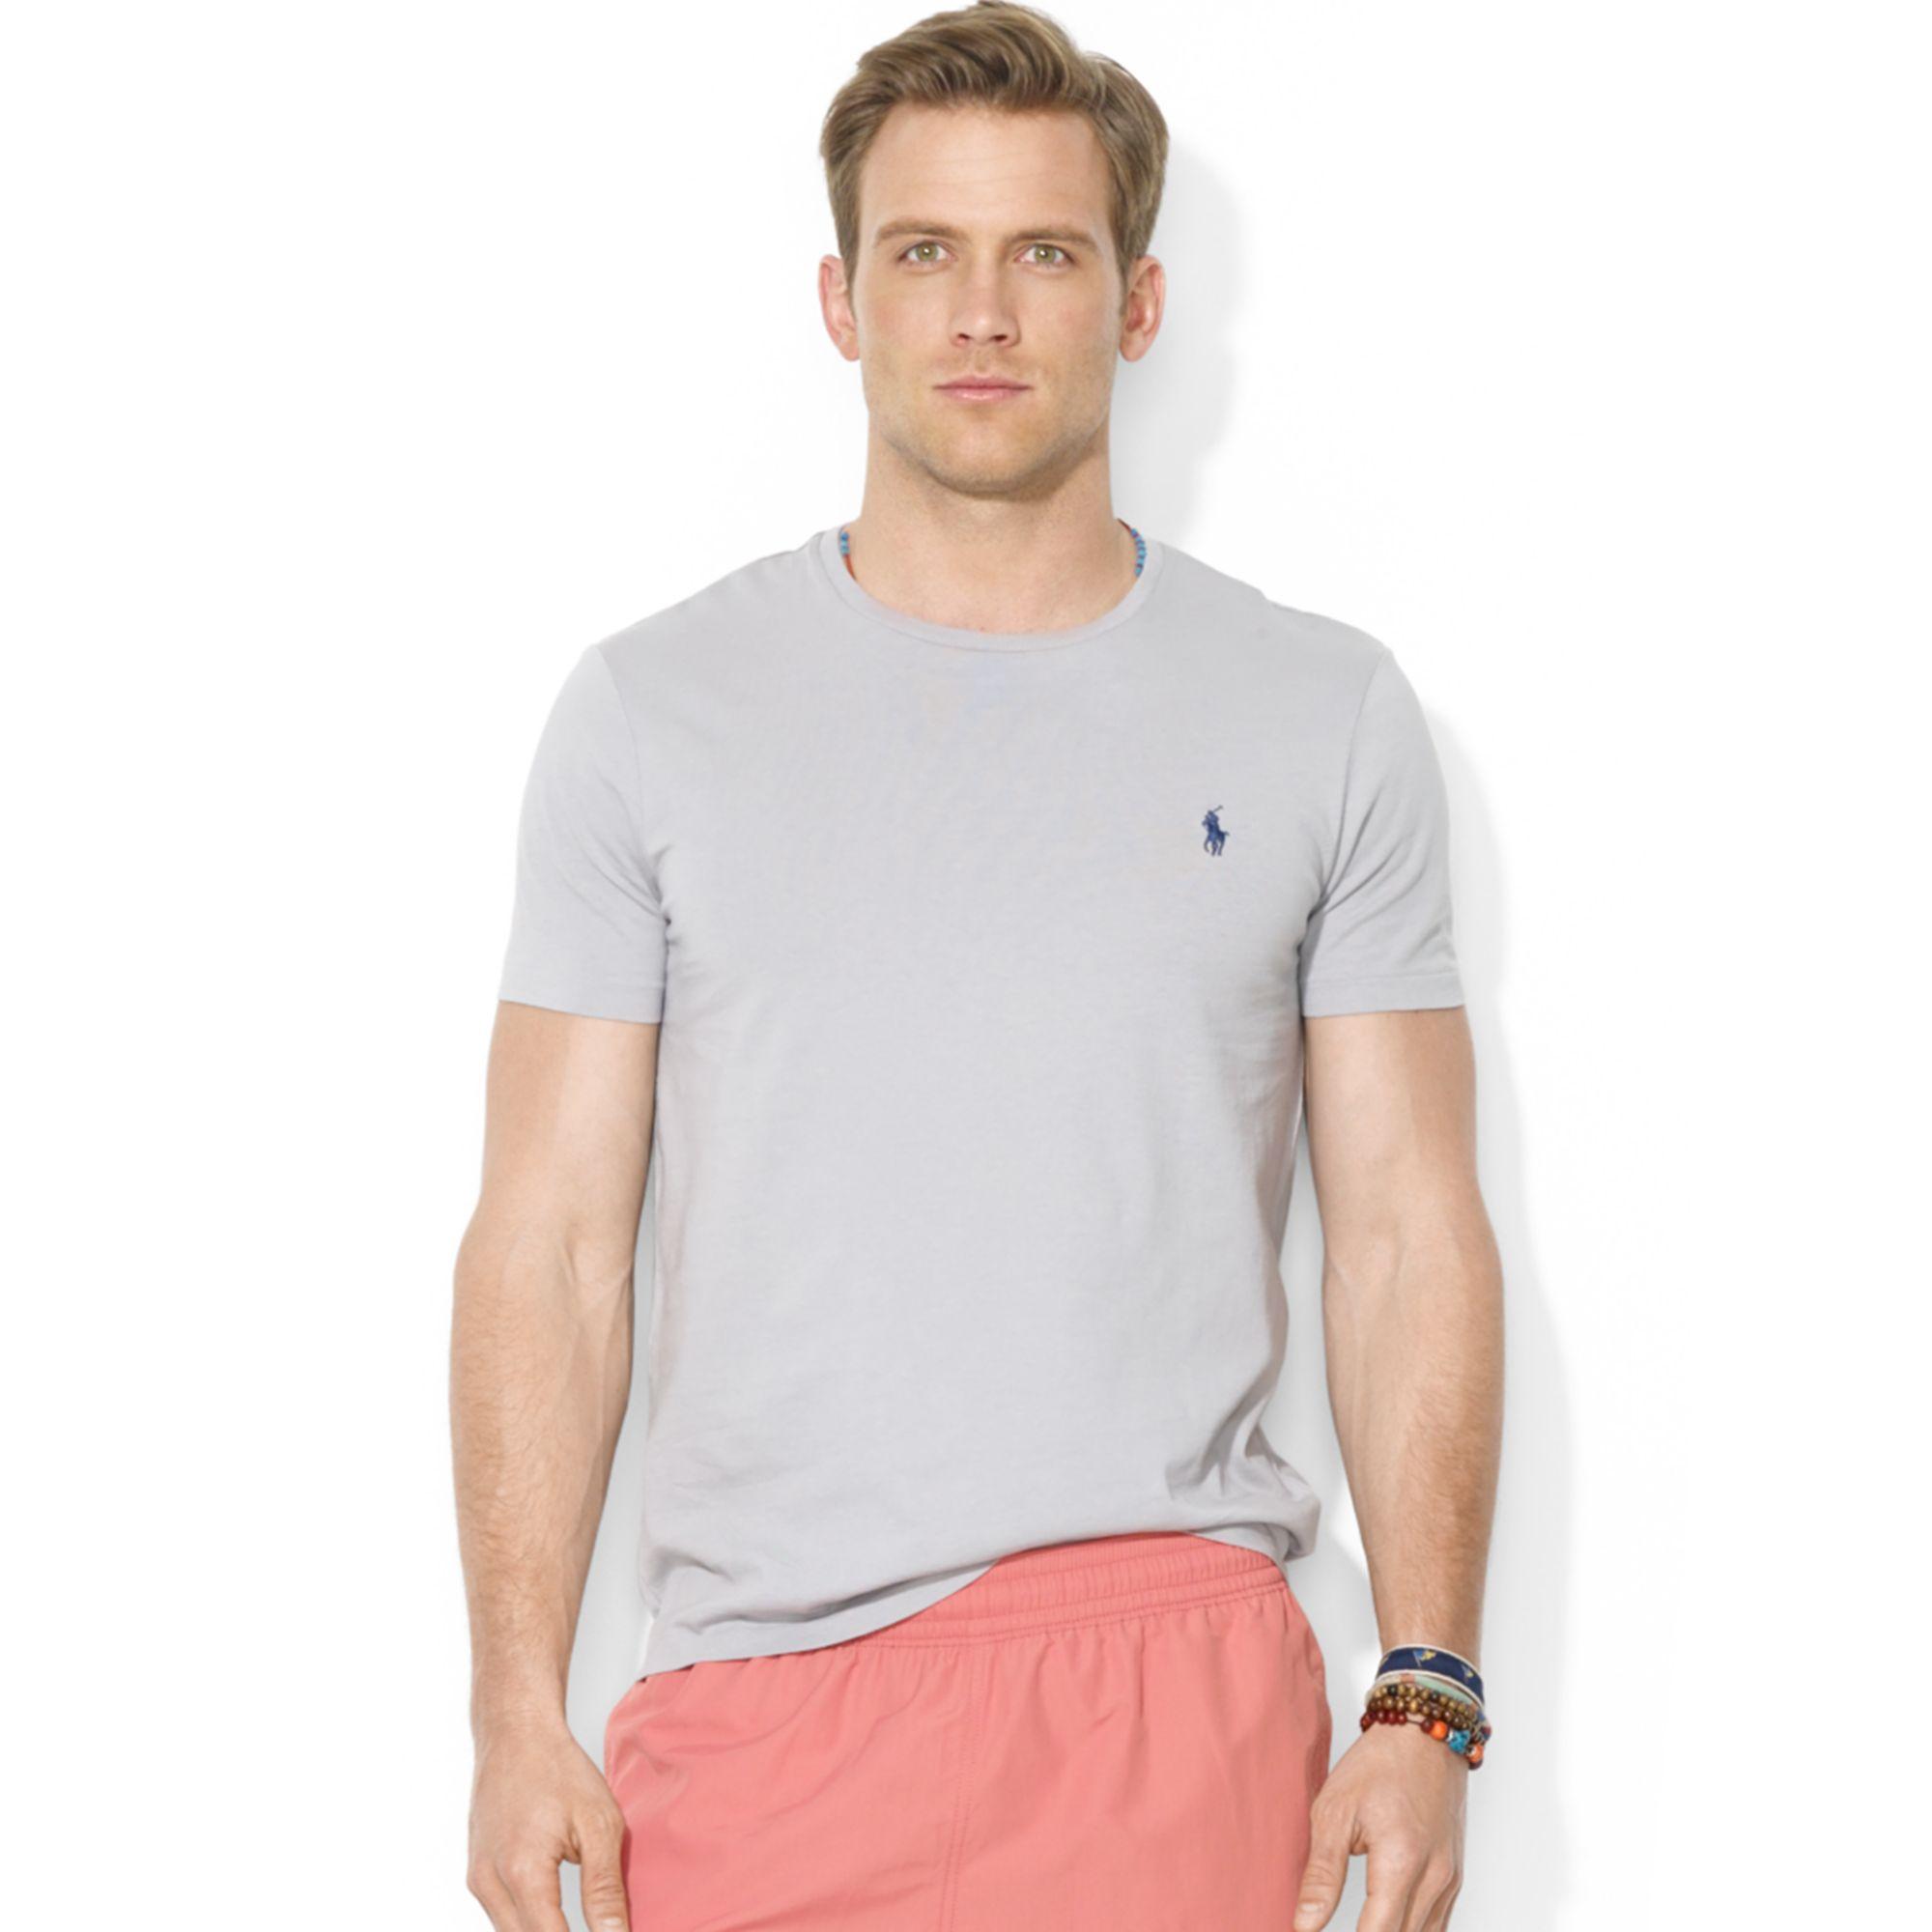 NWT Polo Ralph Lauren Men/'s Jersey Crew Neck Tee T-Shirt